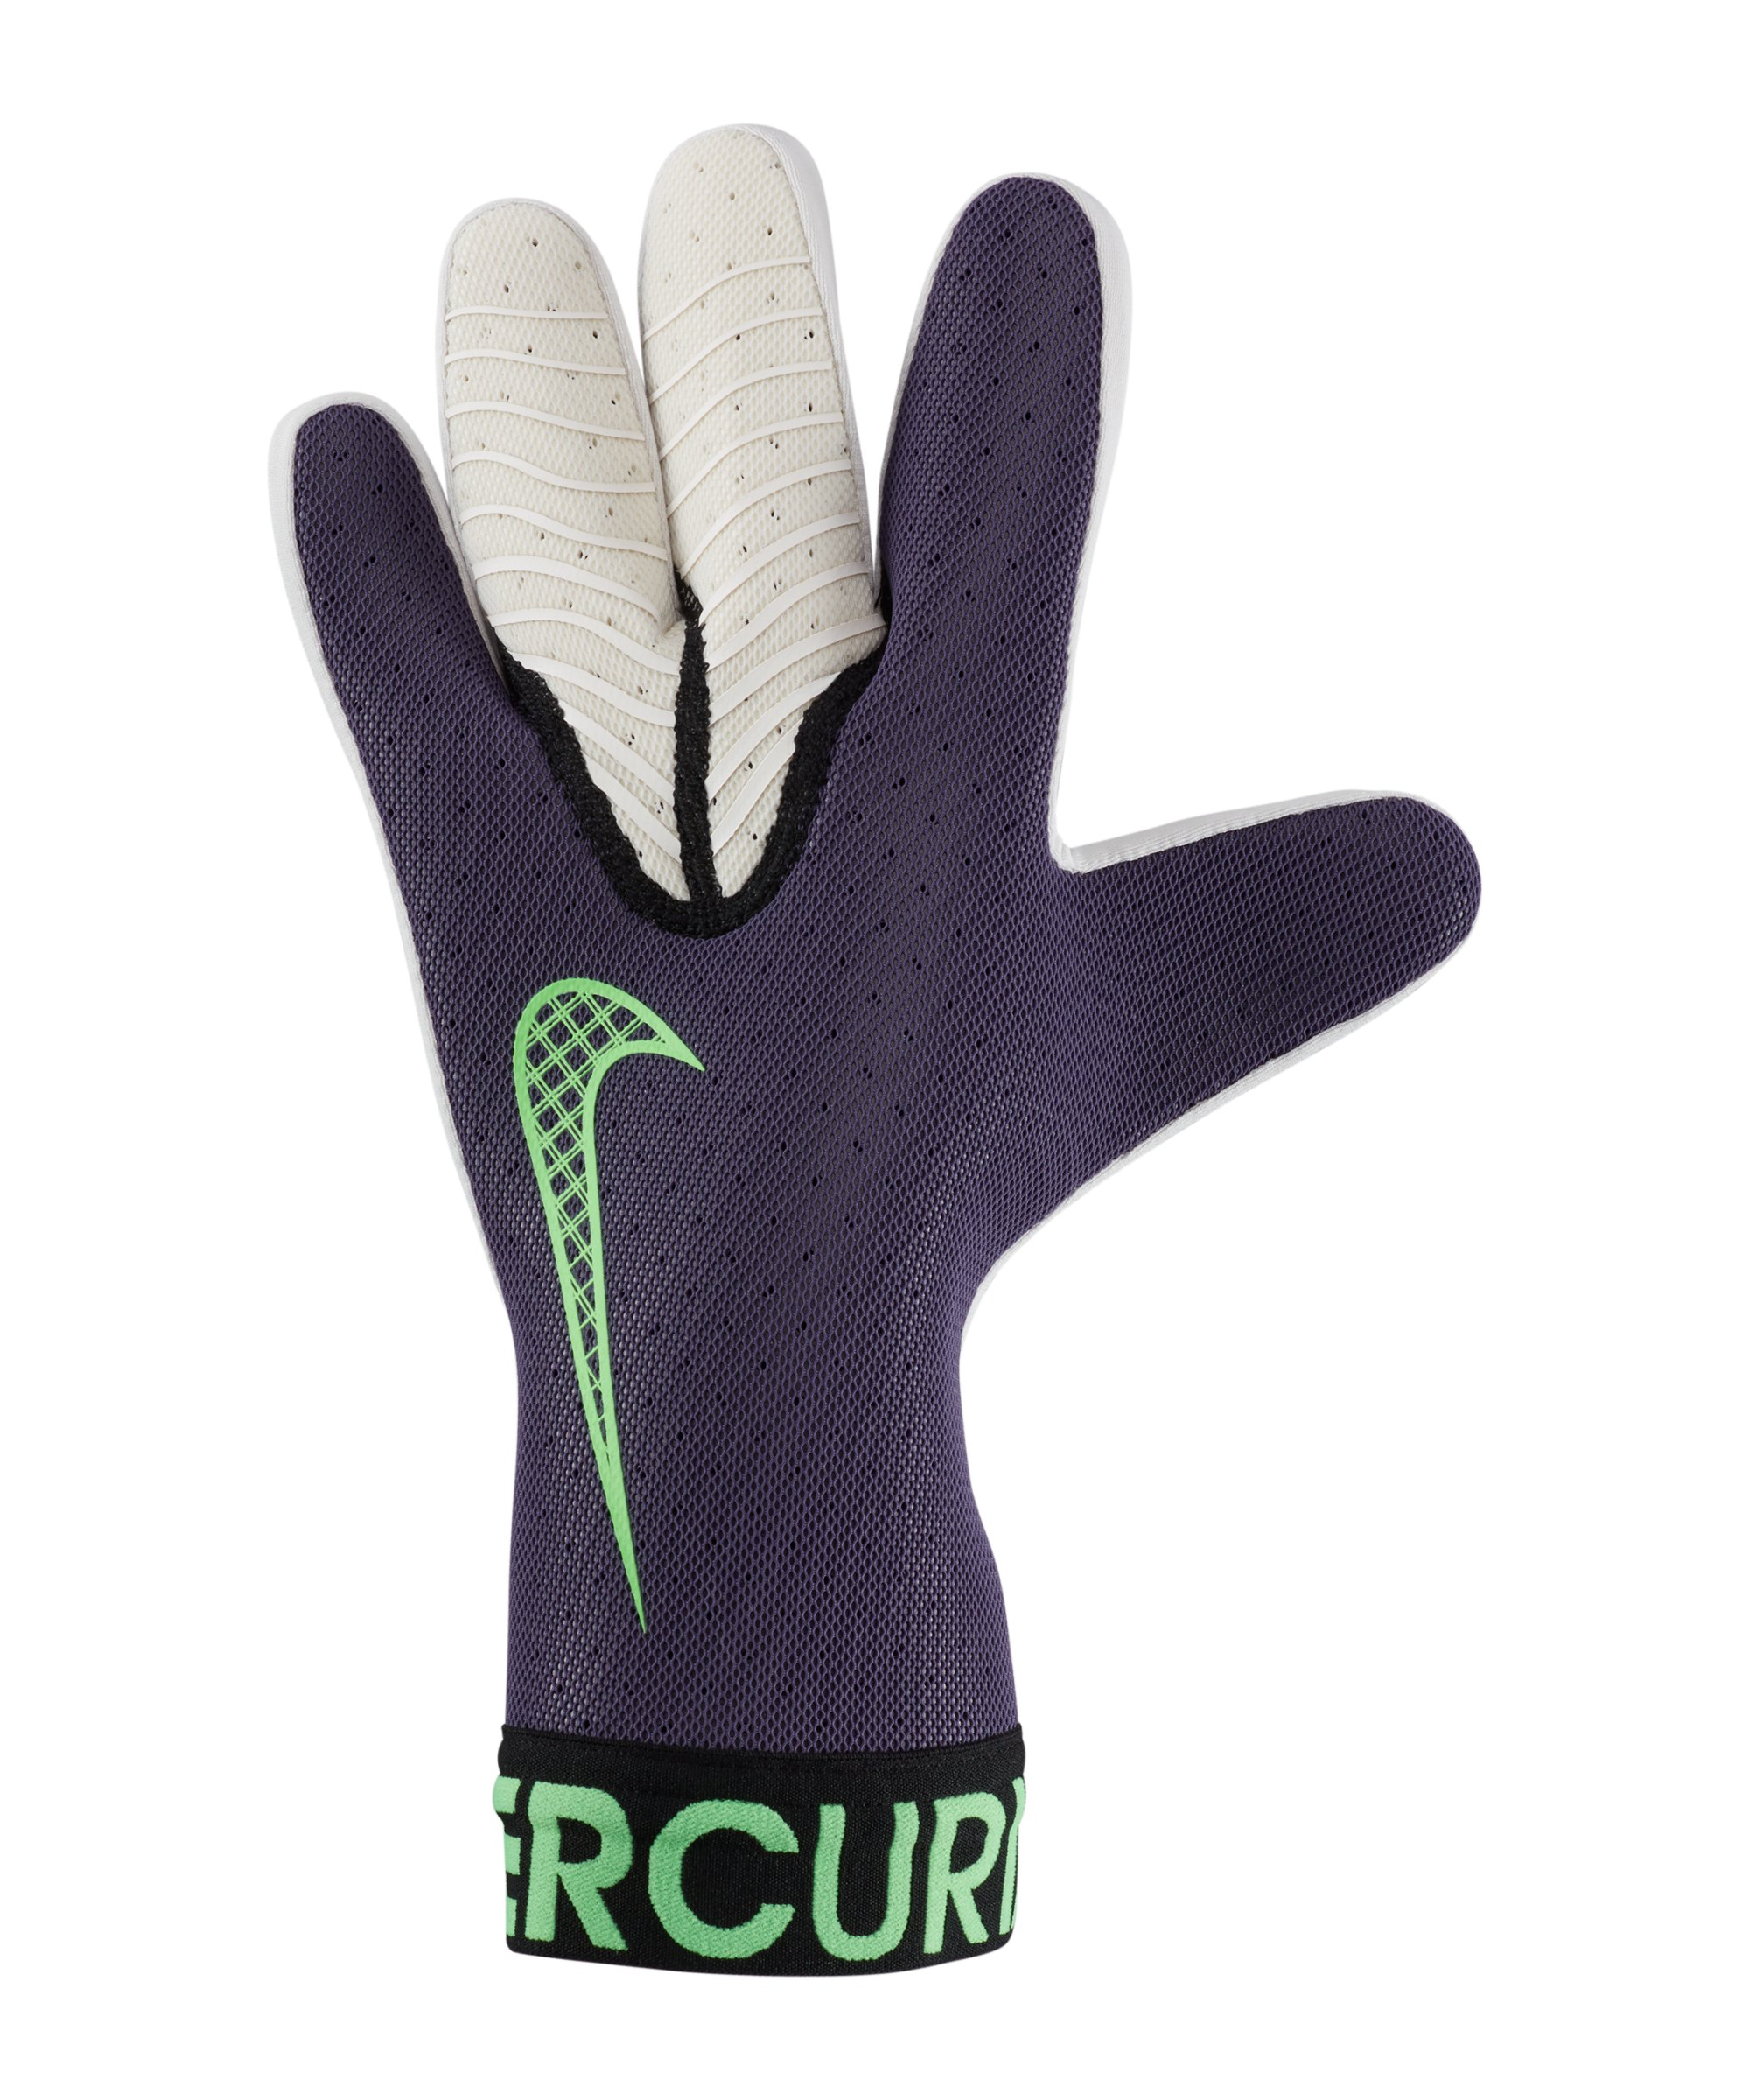 Nike Mercurial Touch Elite Torwarthandschuh F573 - lila